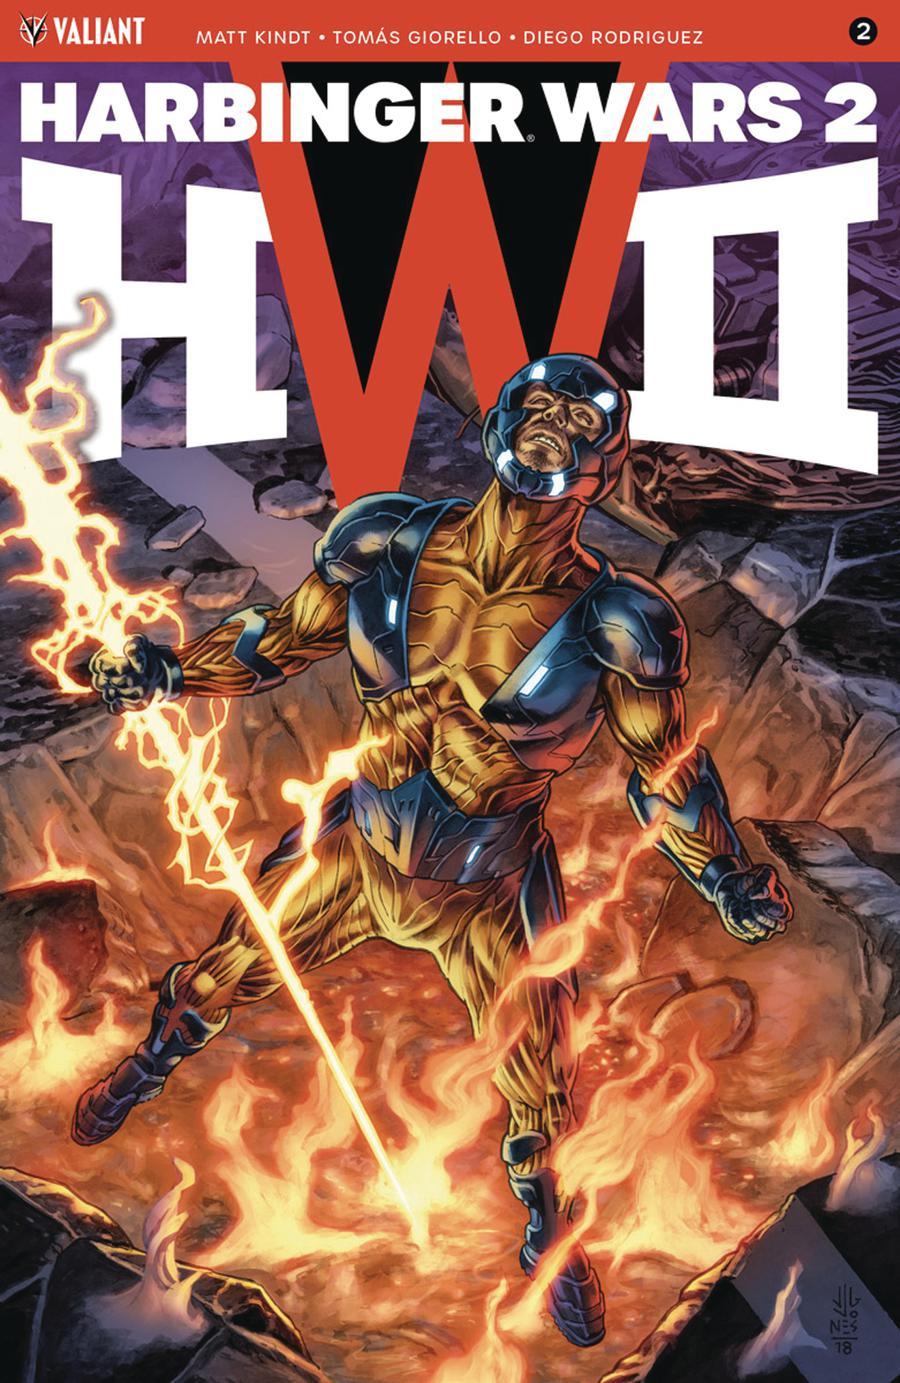 Harbinger Wars 2 #2 Cover A Regular JG Jones Cover